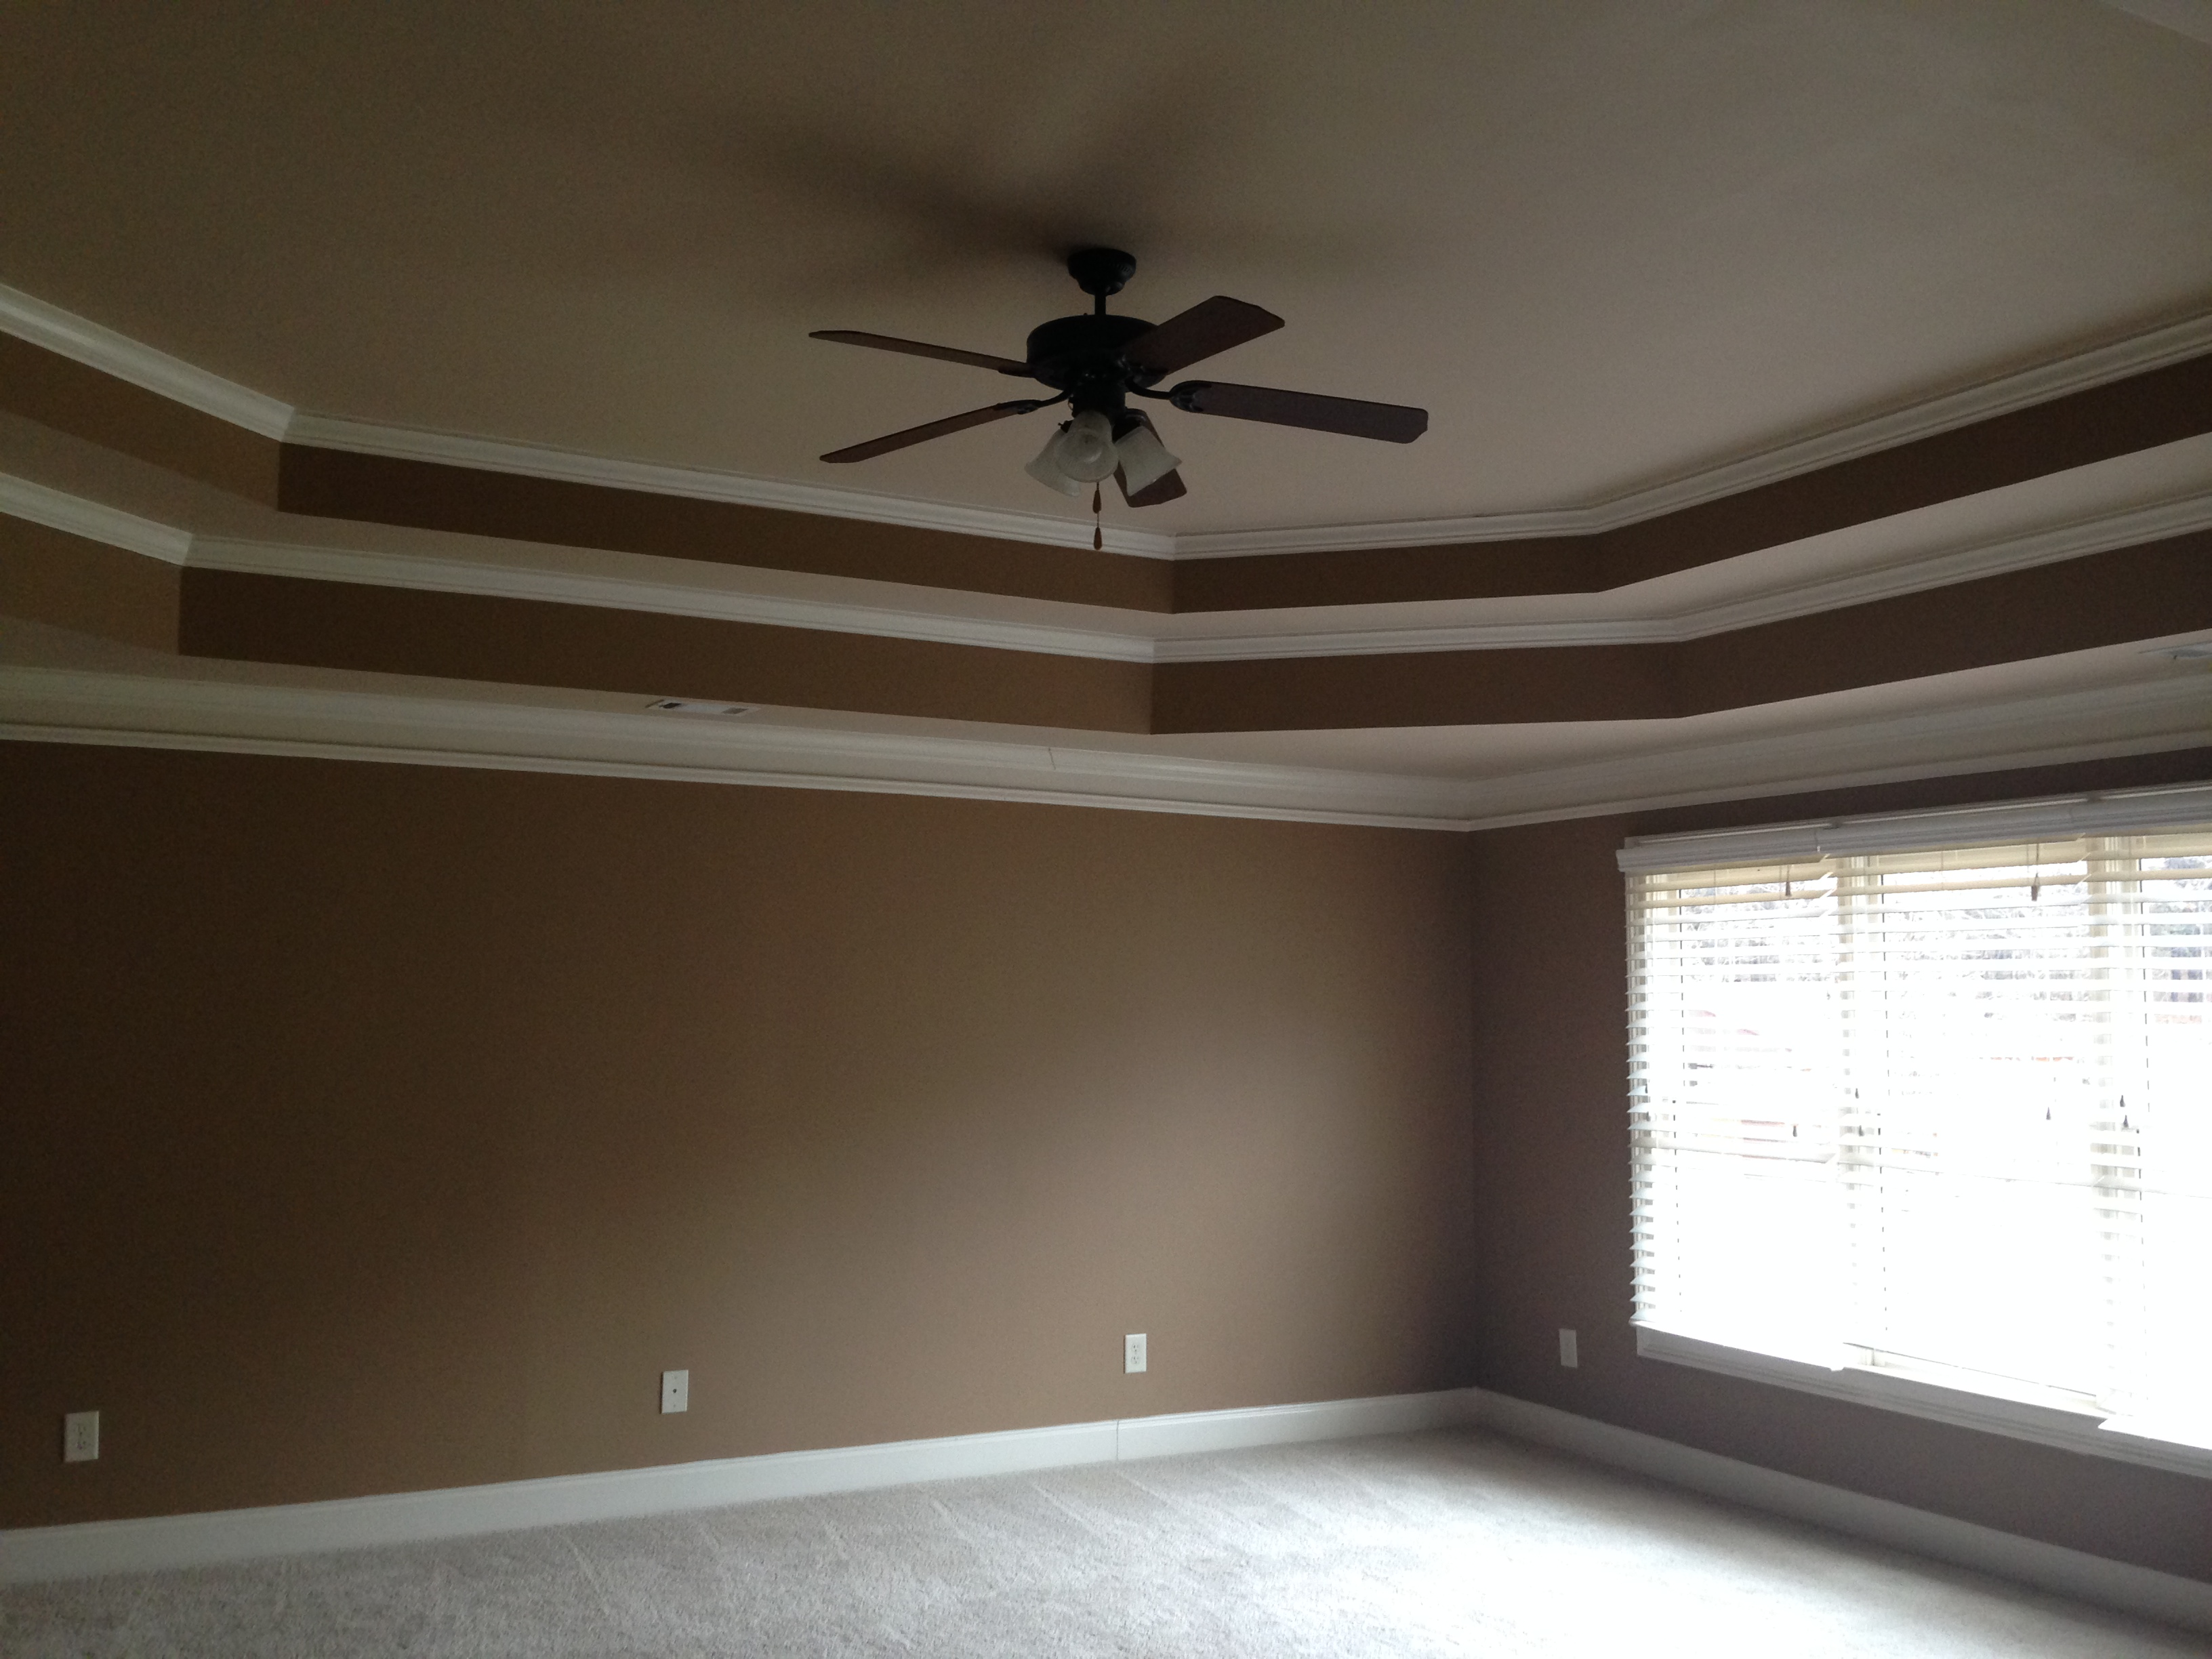 Master Bedroom Flooring Our Master Bedroom Flooring Reveal Addisons Wonderland